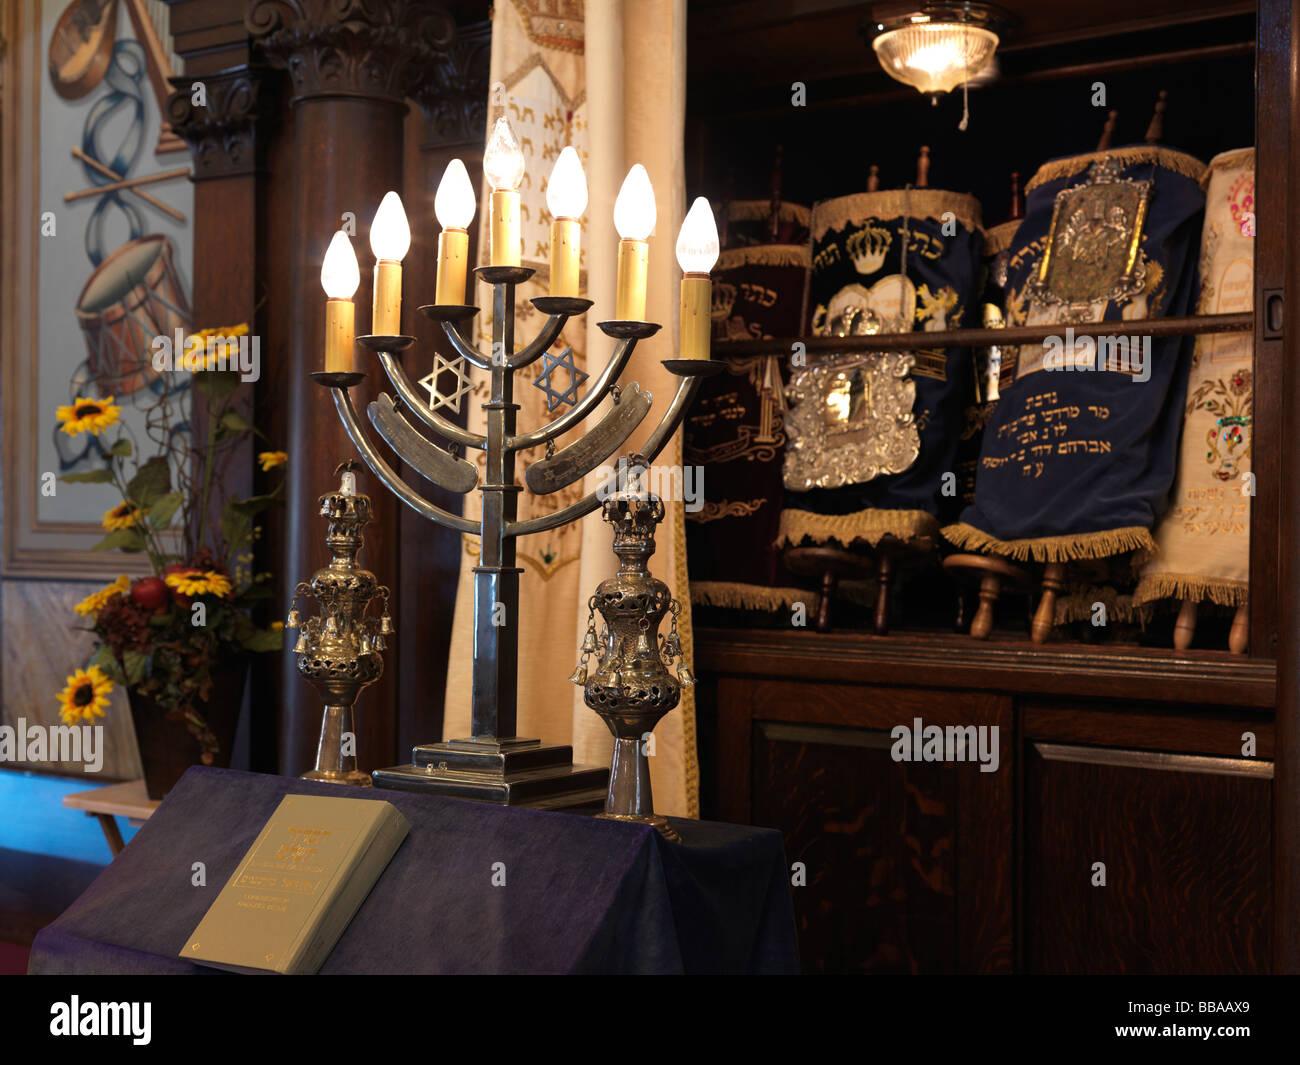 Jewish Synagogue interior - Stock Image